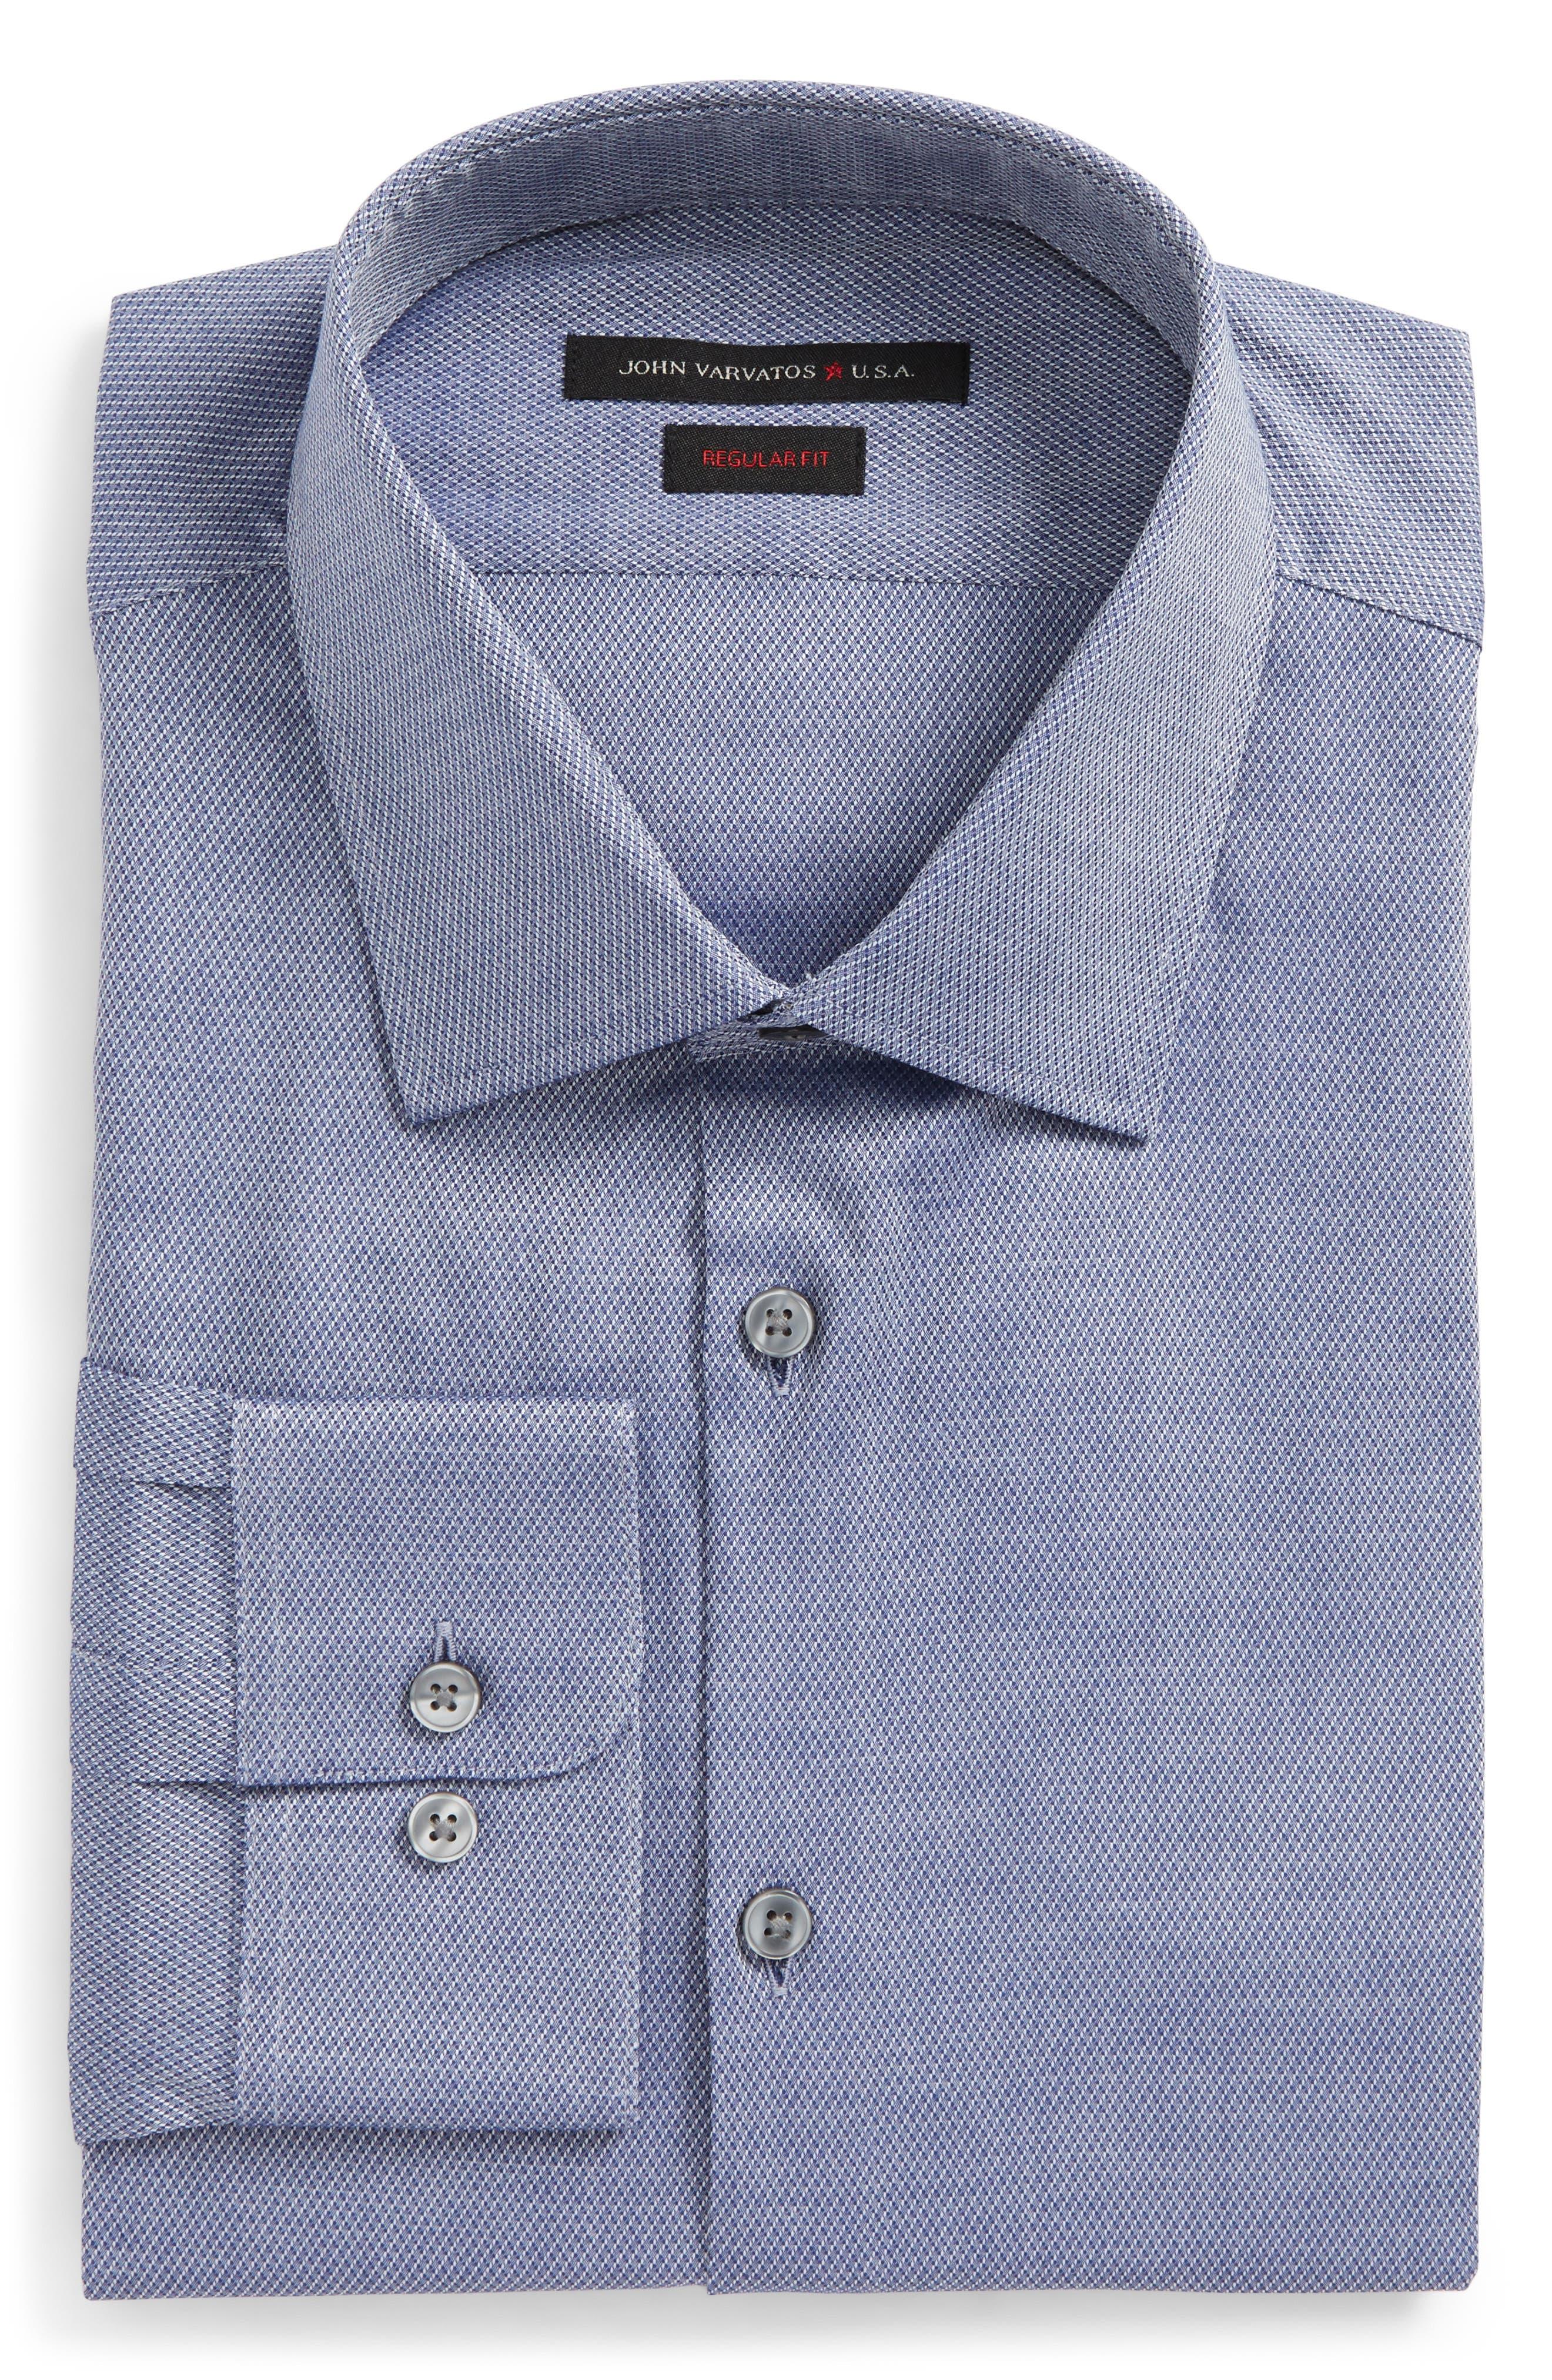 Regular Fit Dress Shirt,                         Main,                         color, 439